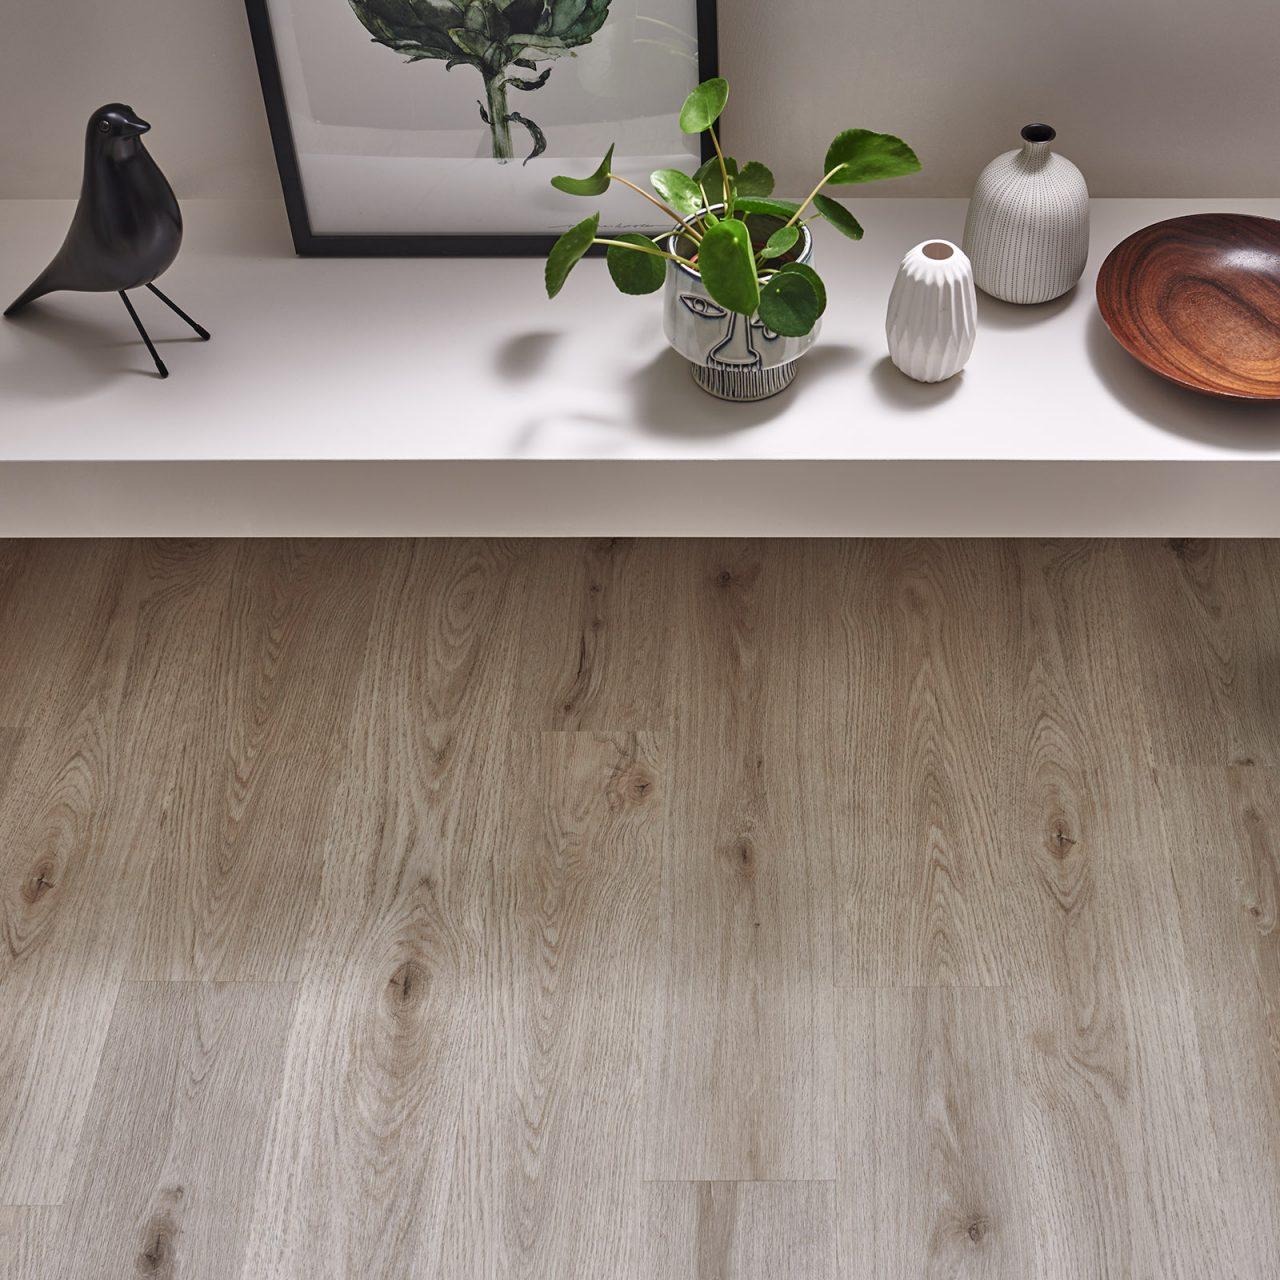 Modern room with light vinyl flooring